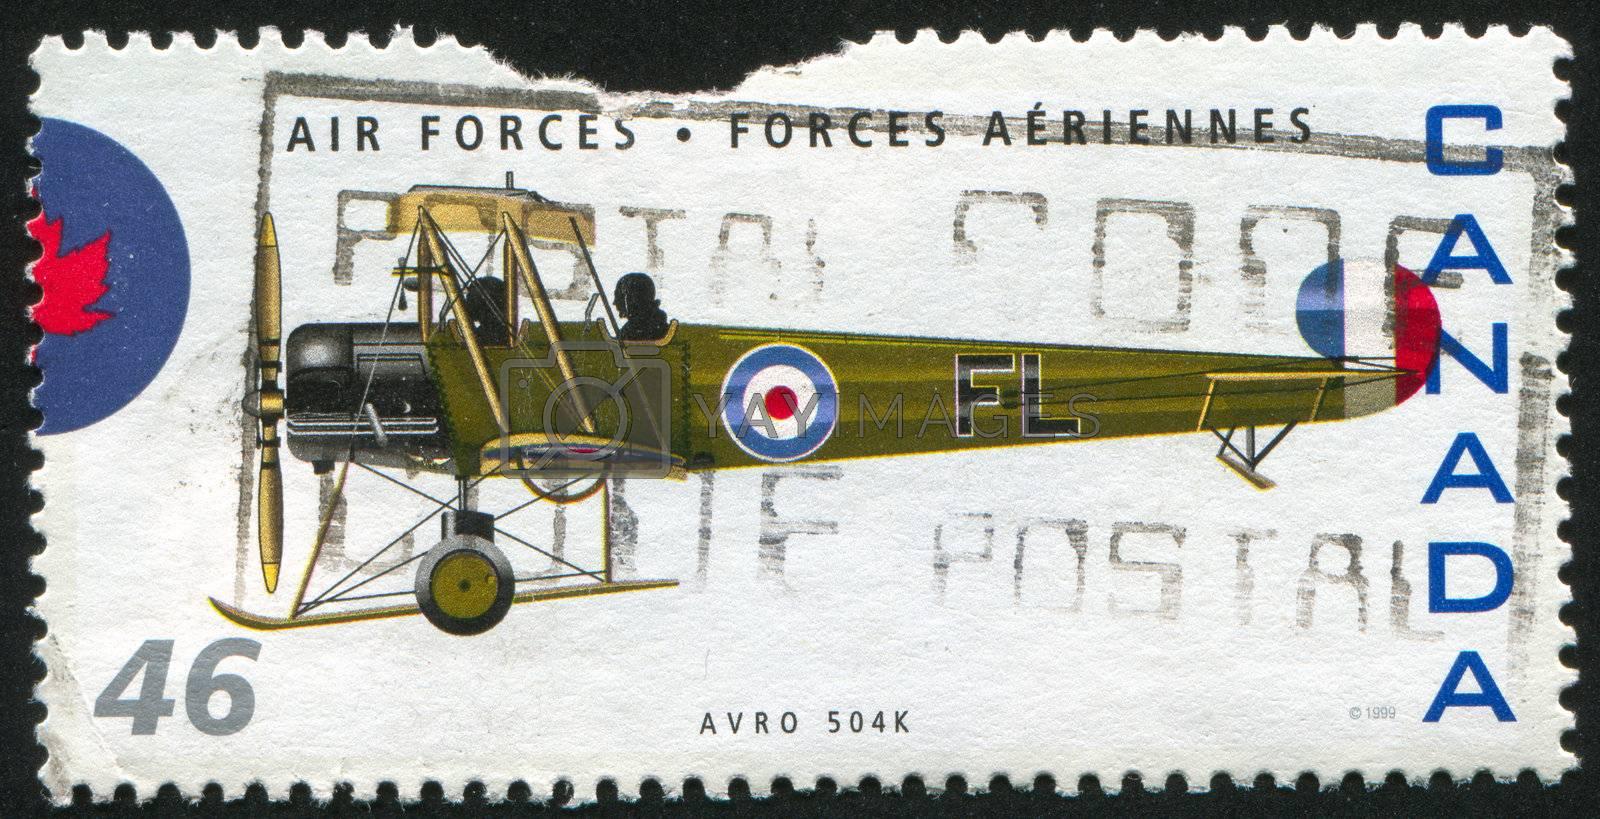 CANADA - CIRCA 1999: stamp printed by Canada, shows aeroplane, Avro 504K, circa 1999